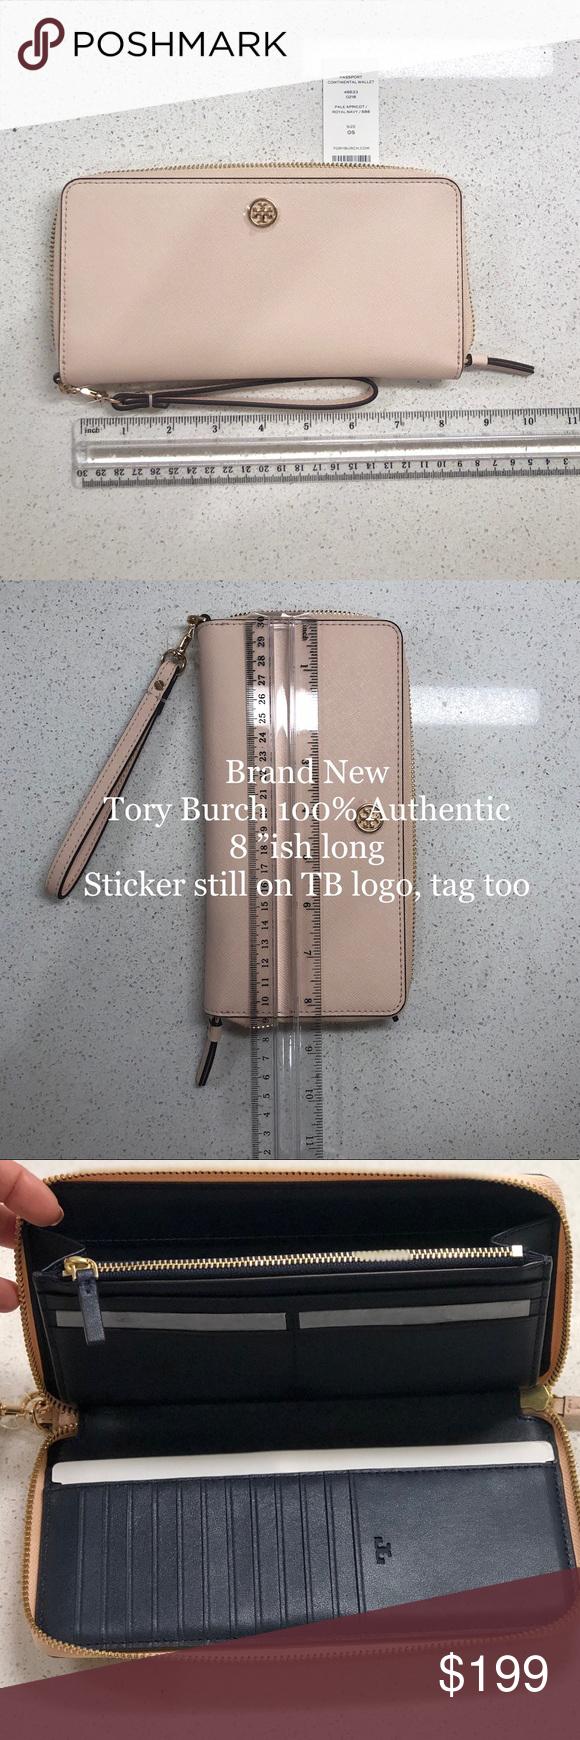 NEW Tory Burch Passport Case Wristlet Clutch Purse Purple